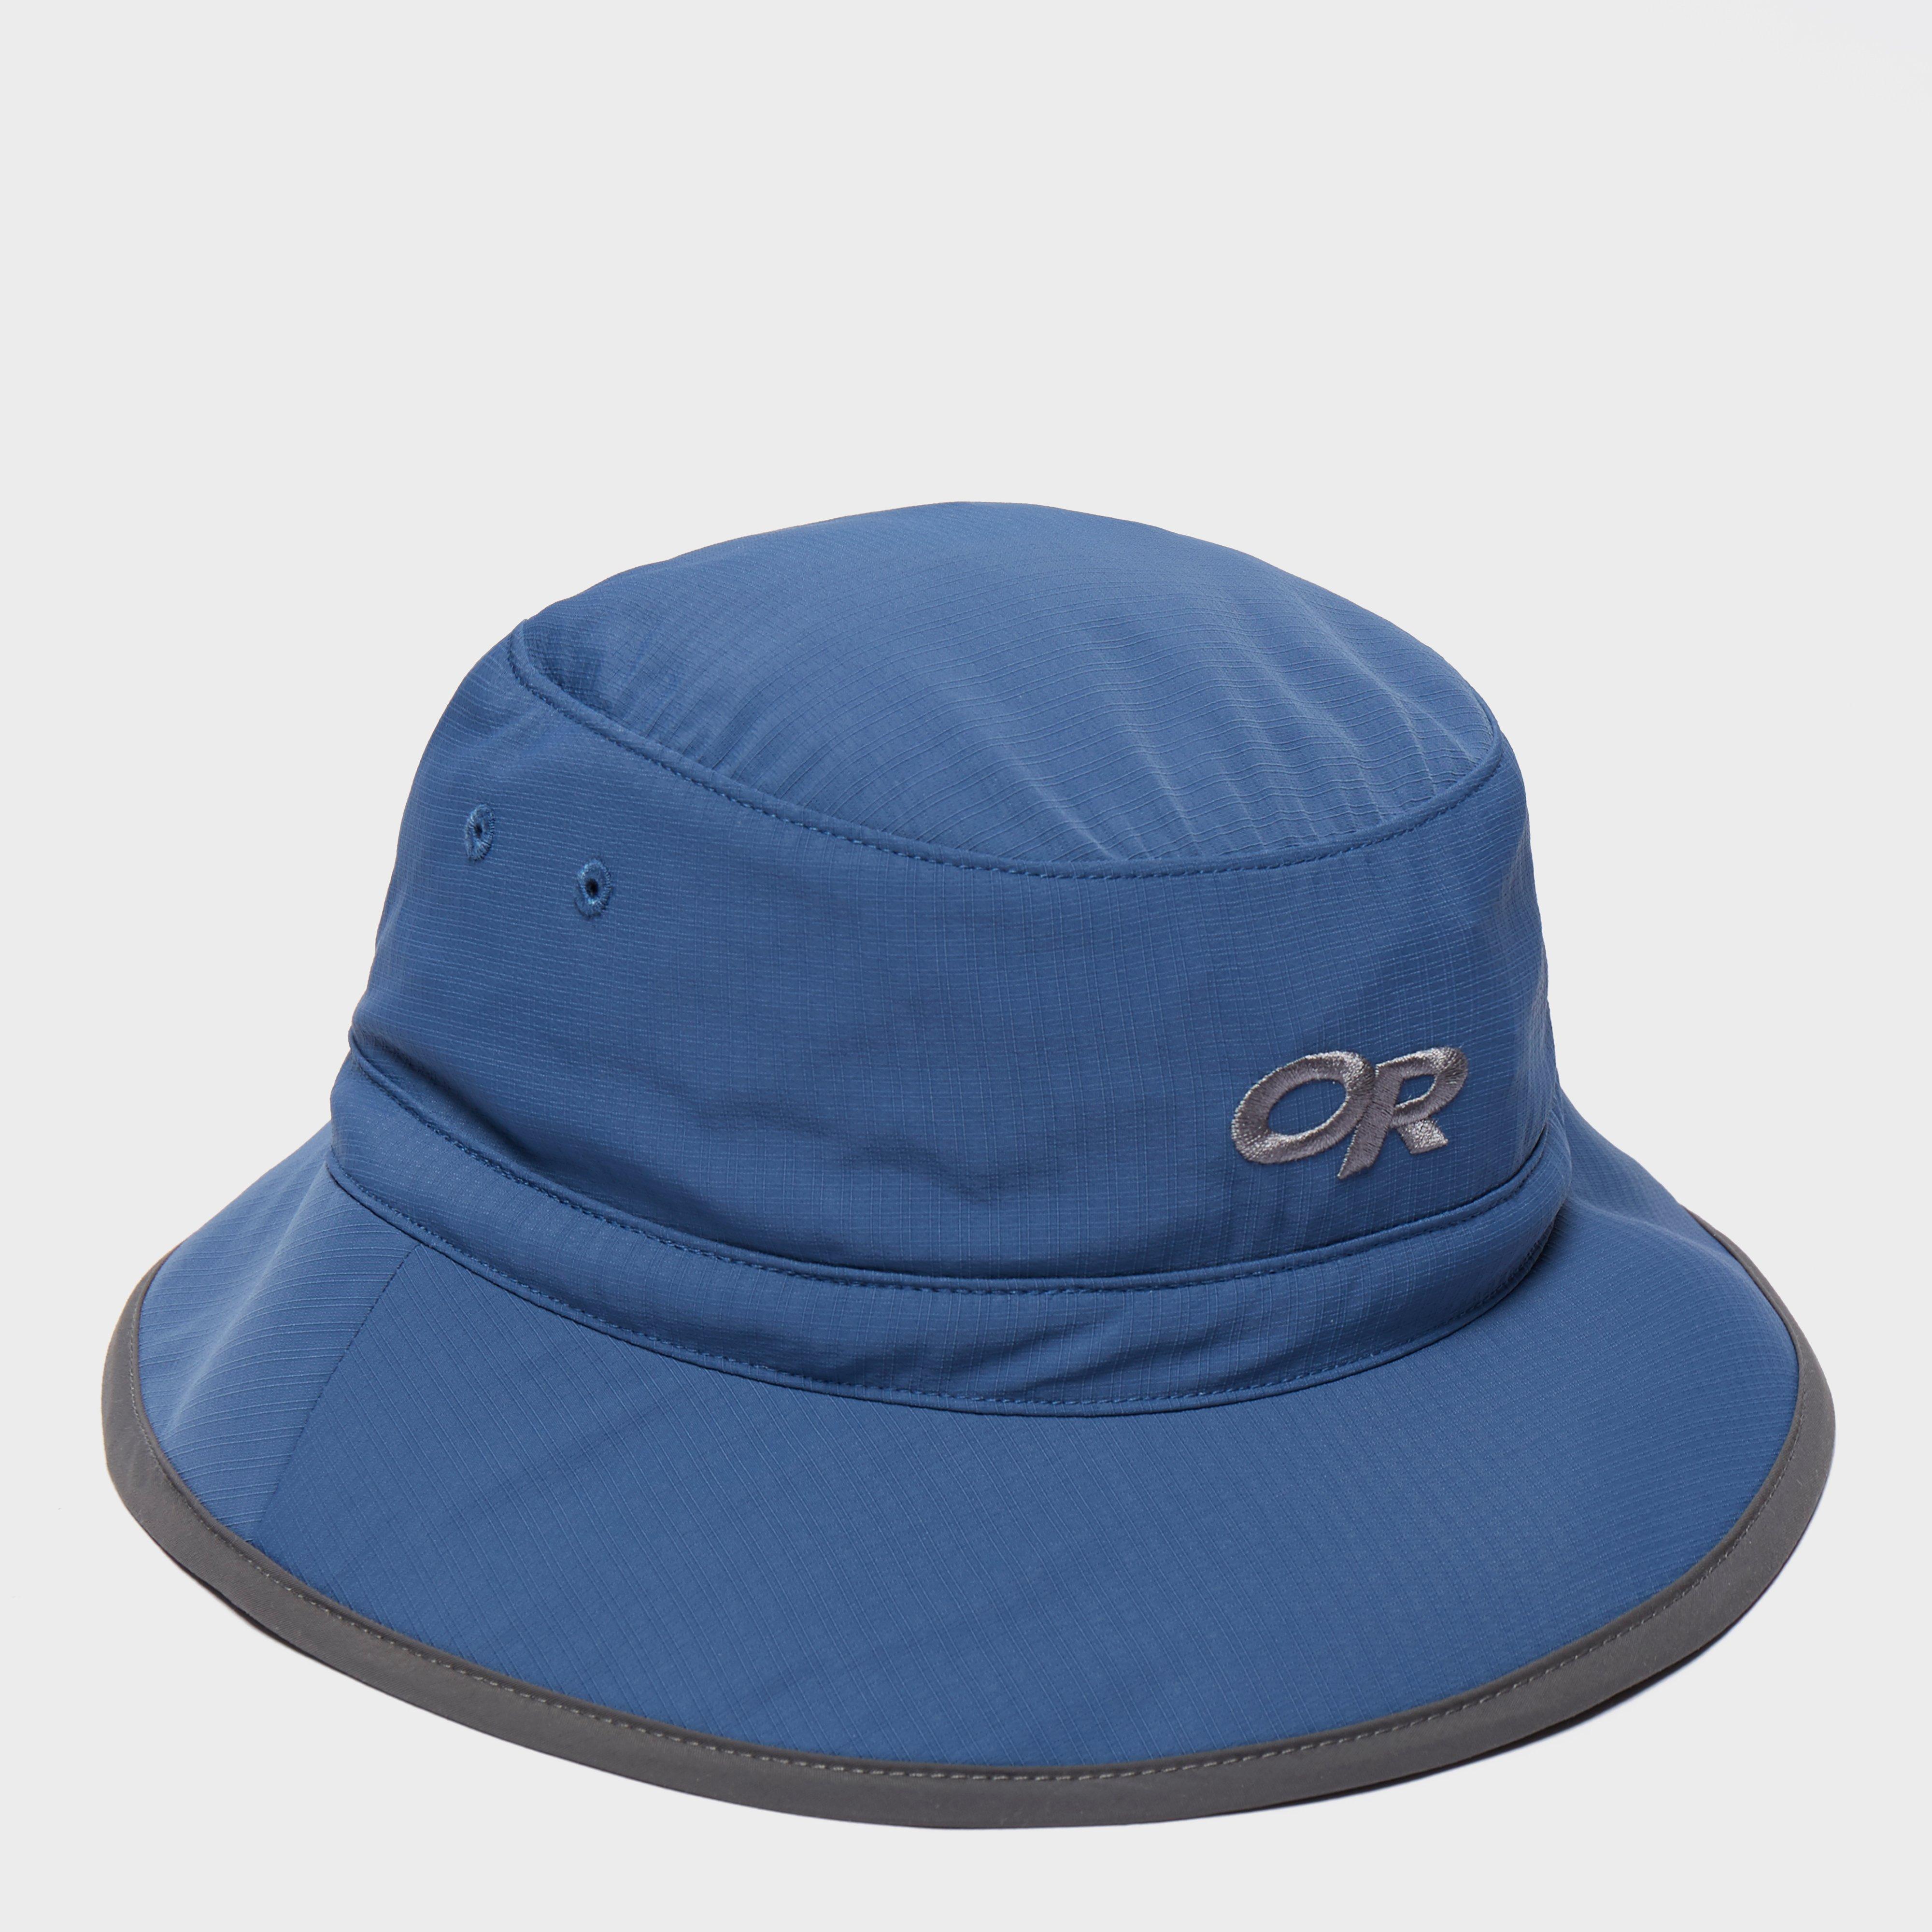 Outdoor Research Outdoor Research Sun Bucket Hat - Navy, Navy